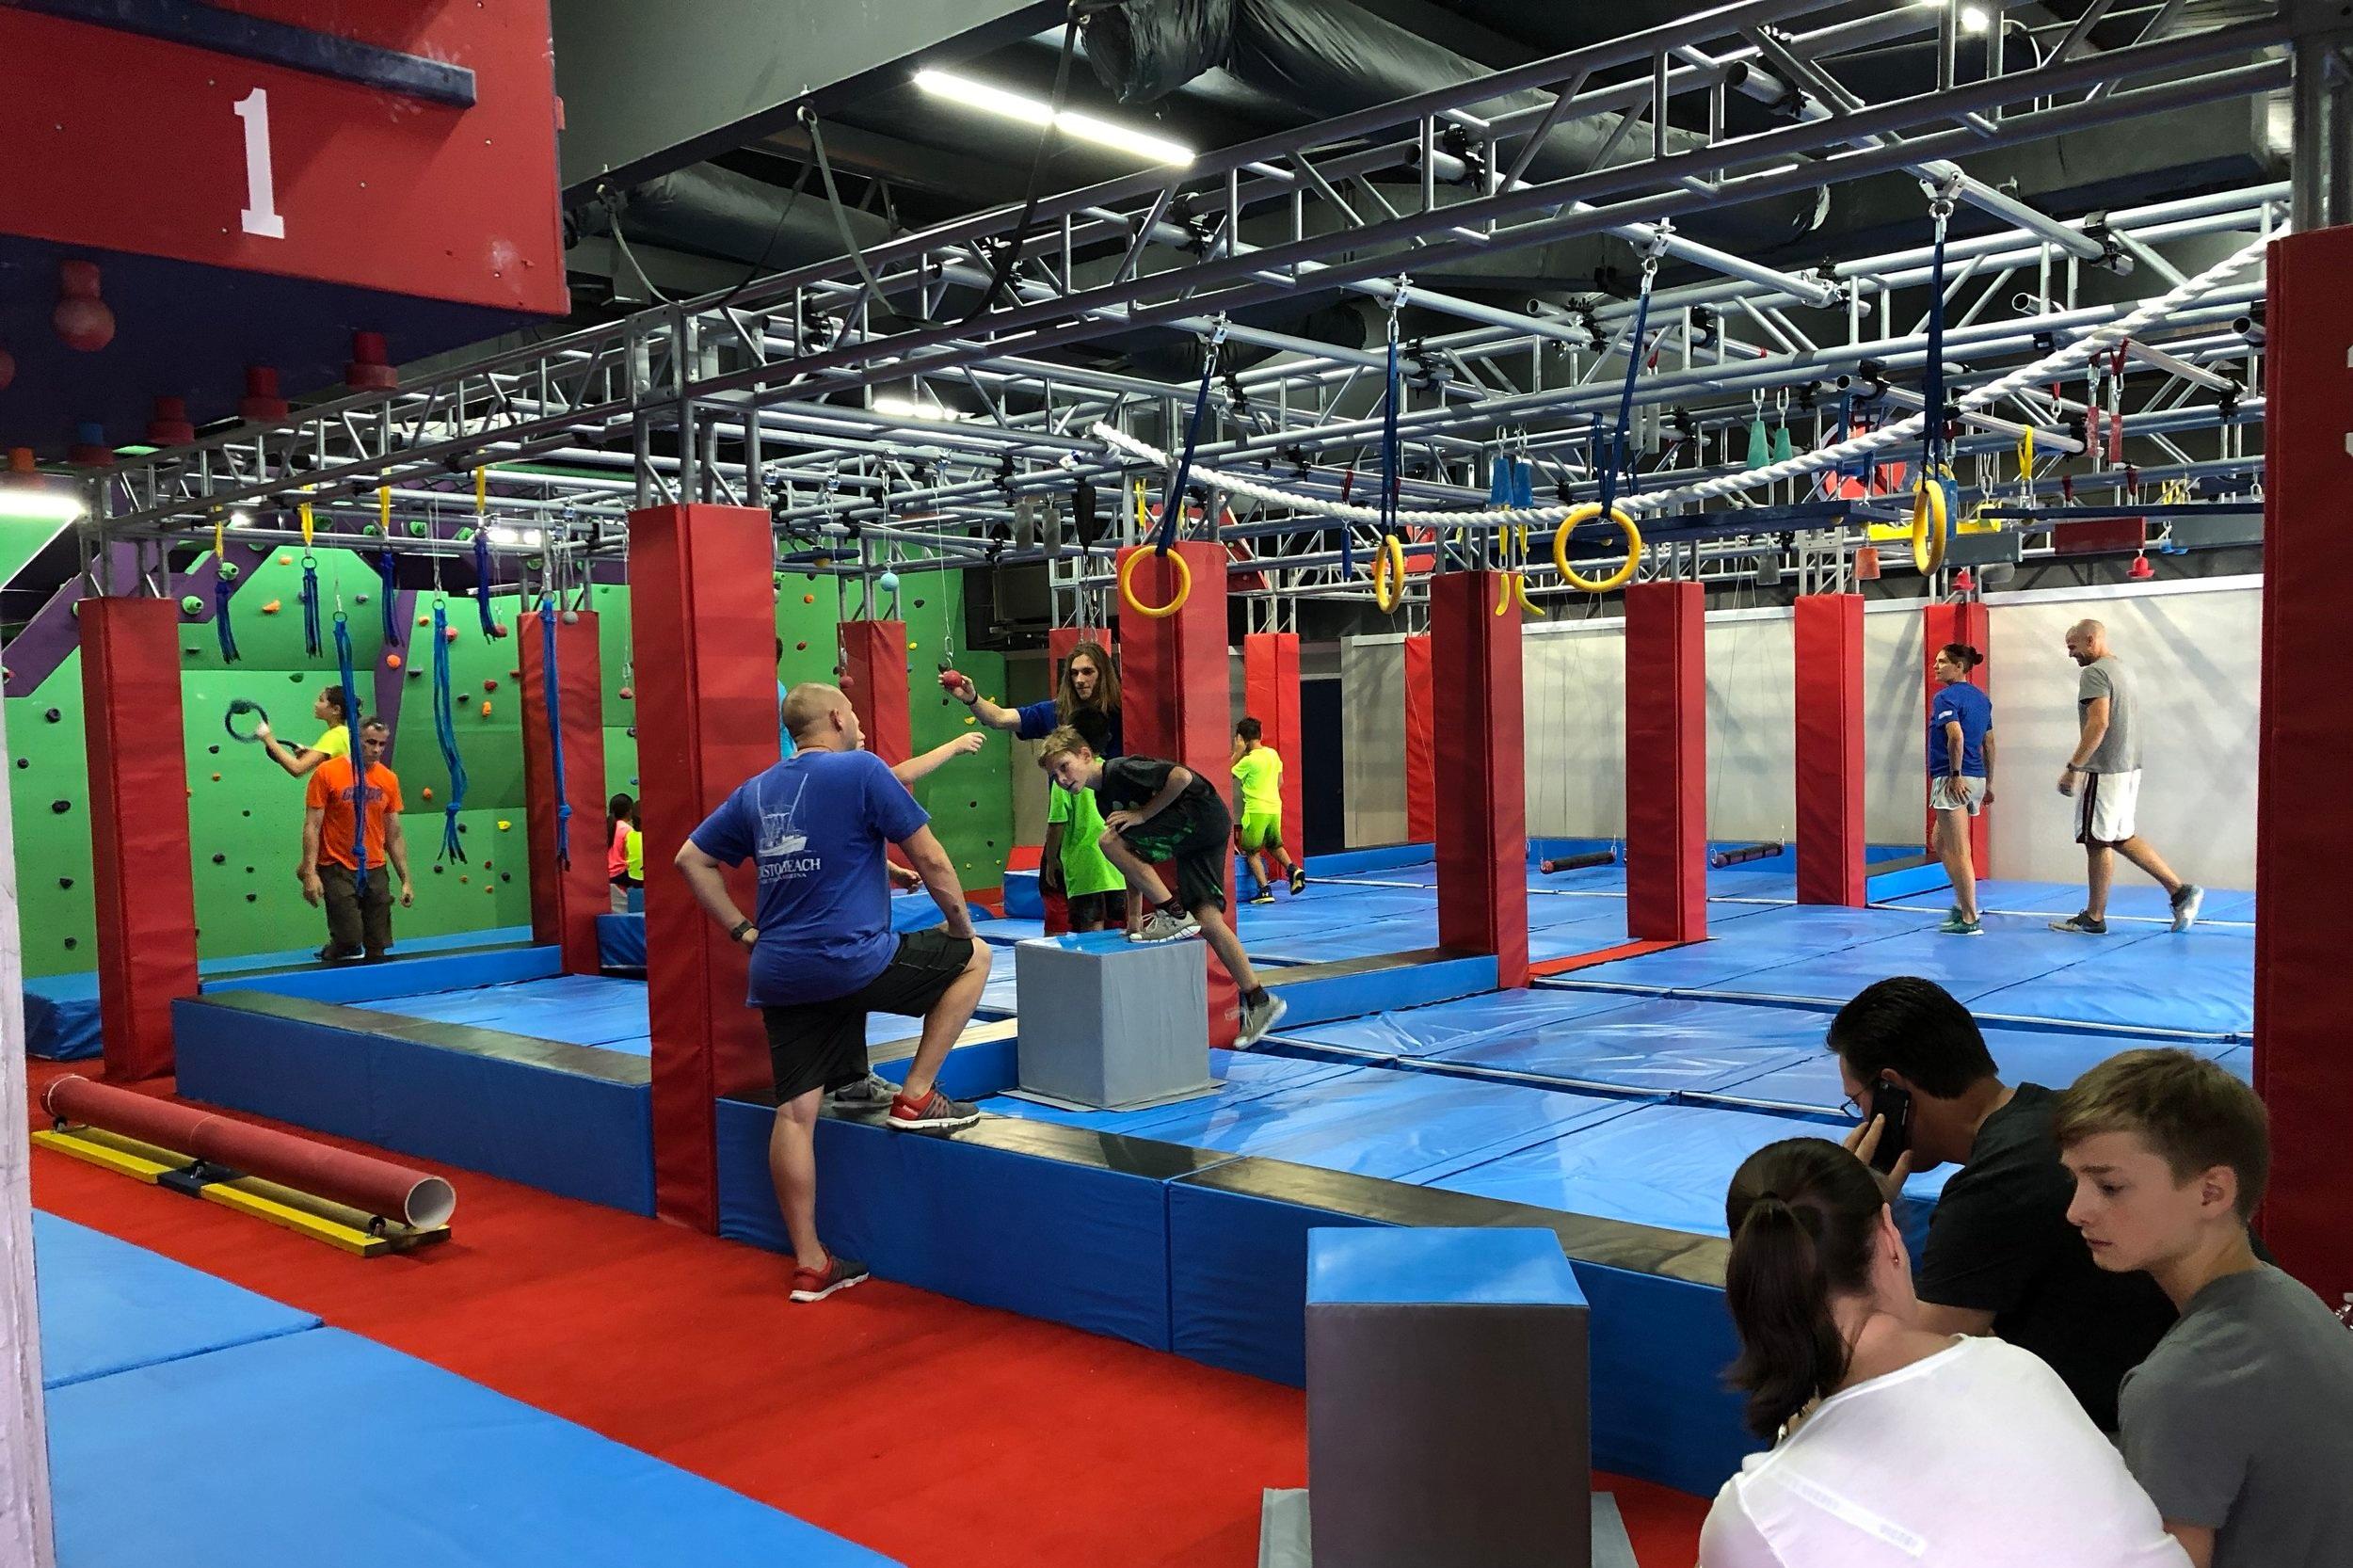 ninja+gym+design.jpg